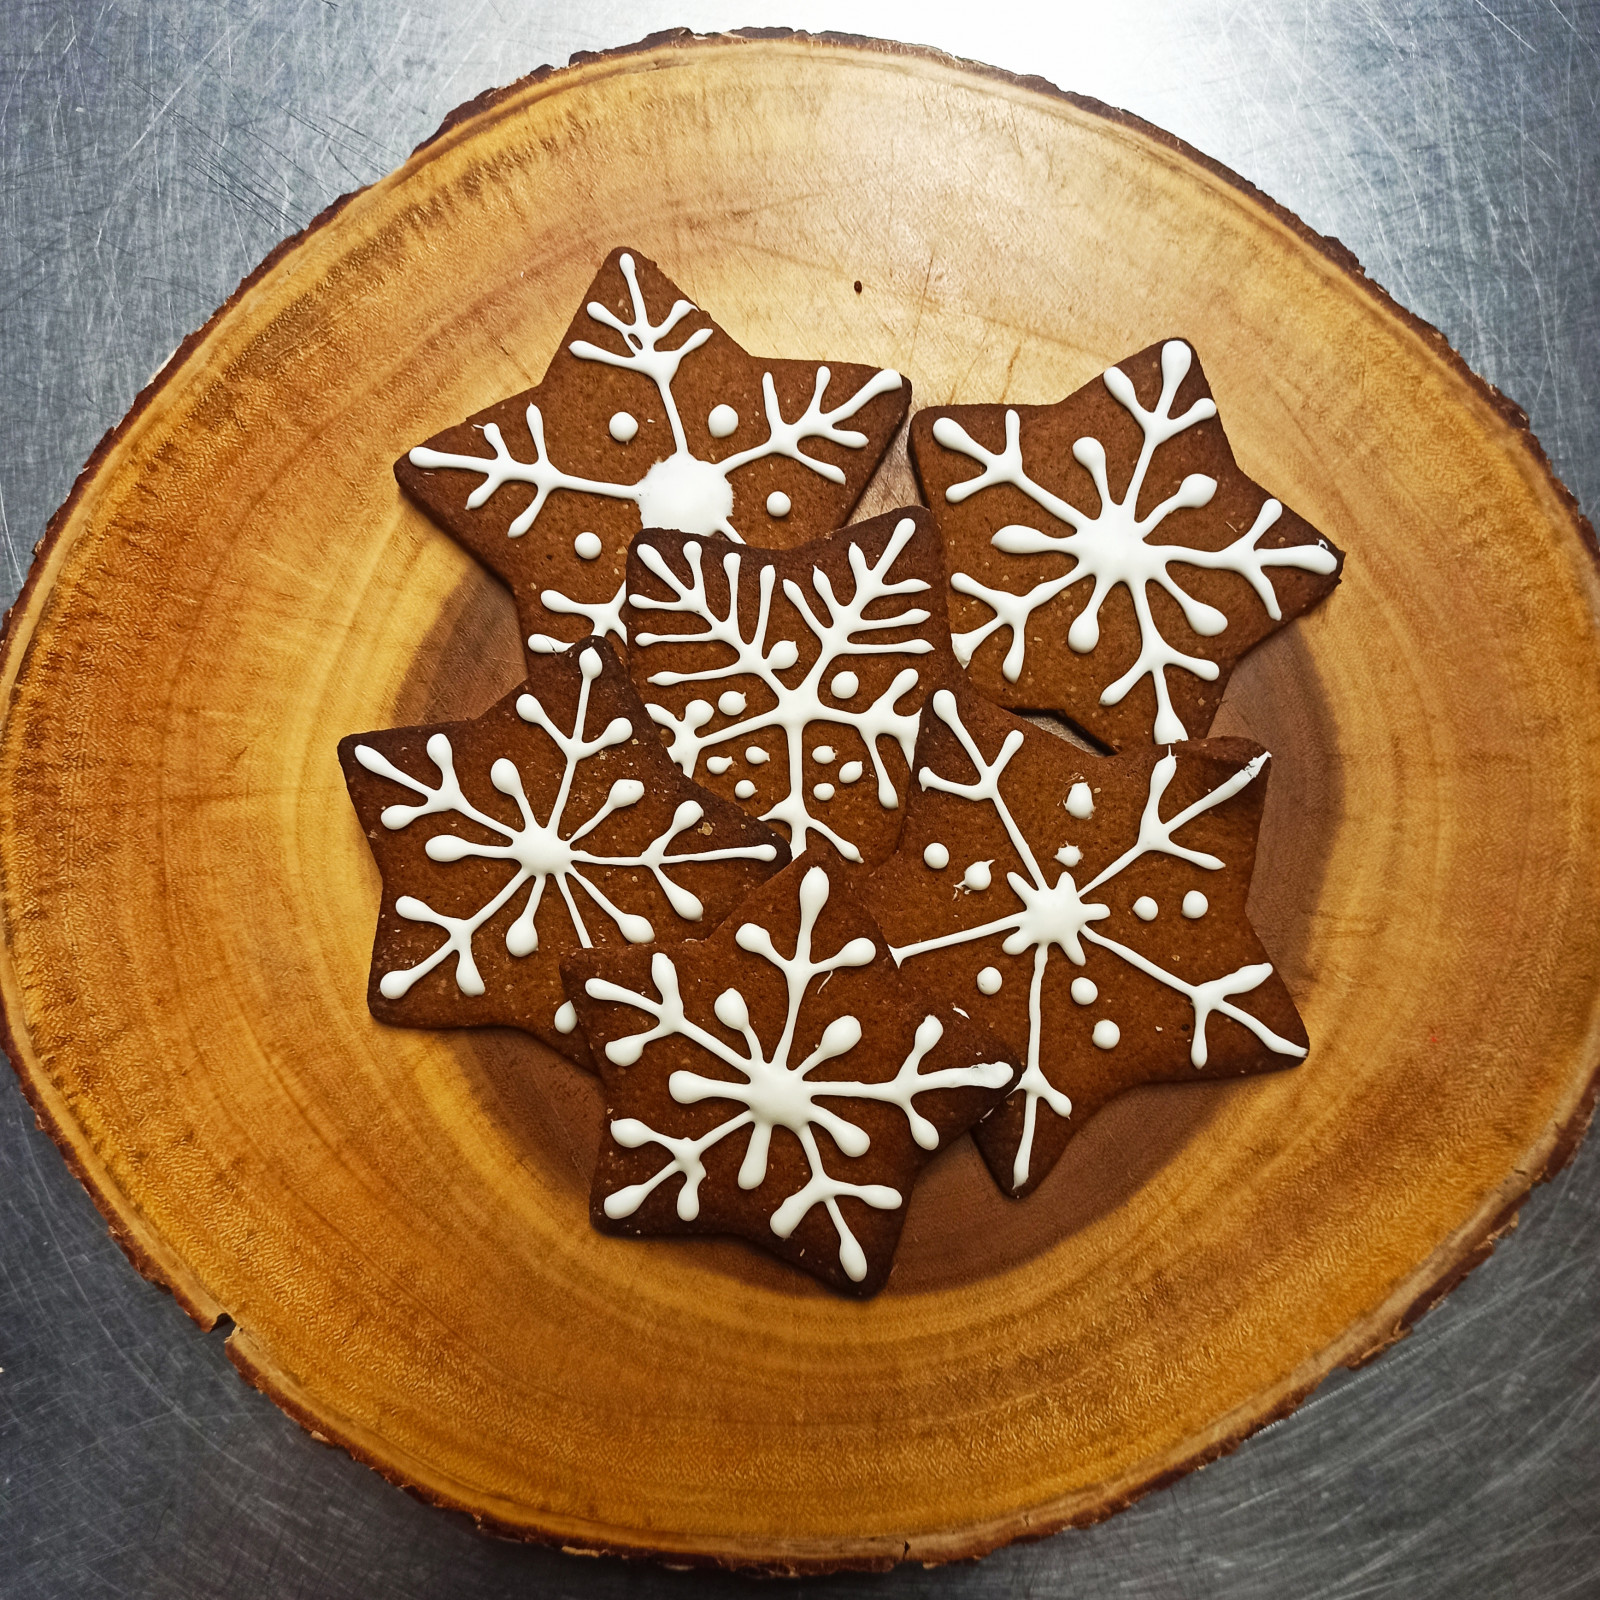 Gingerbread stars - gf